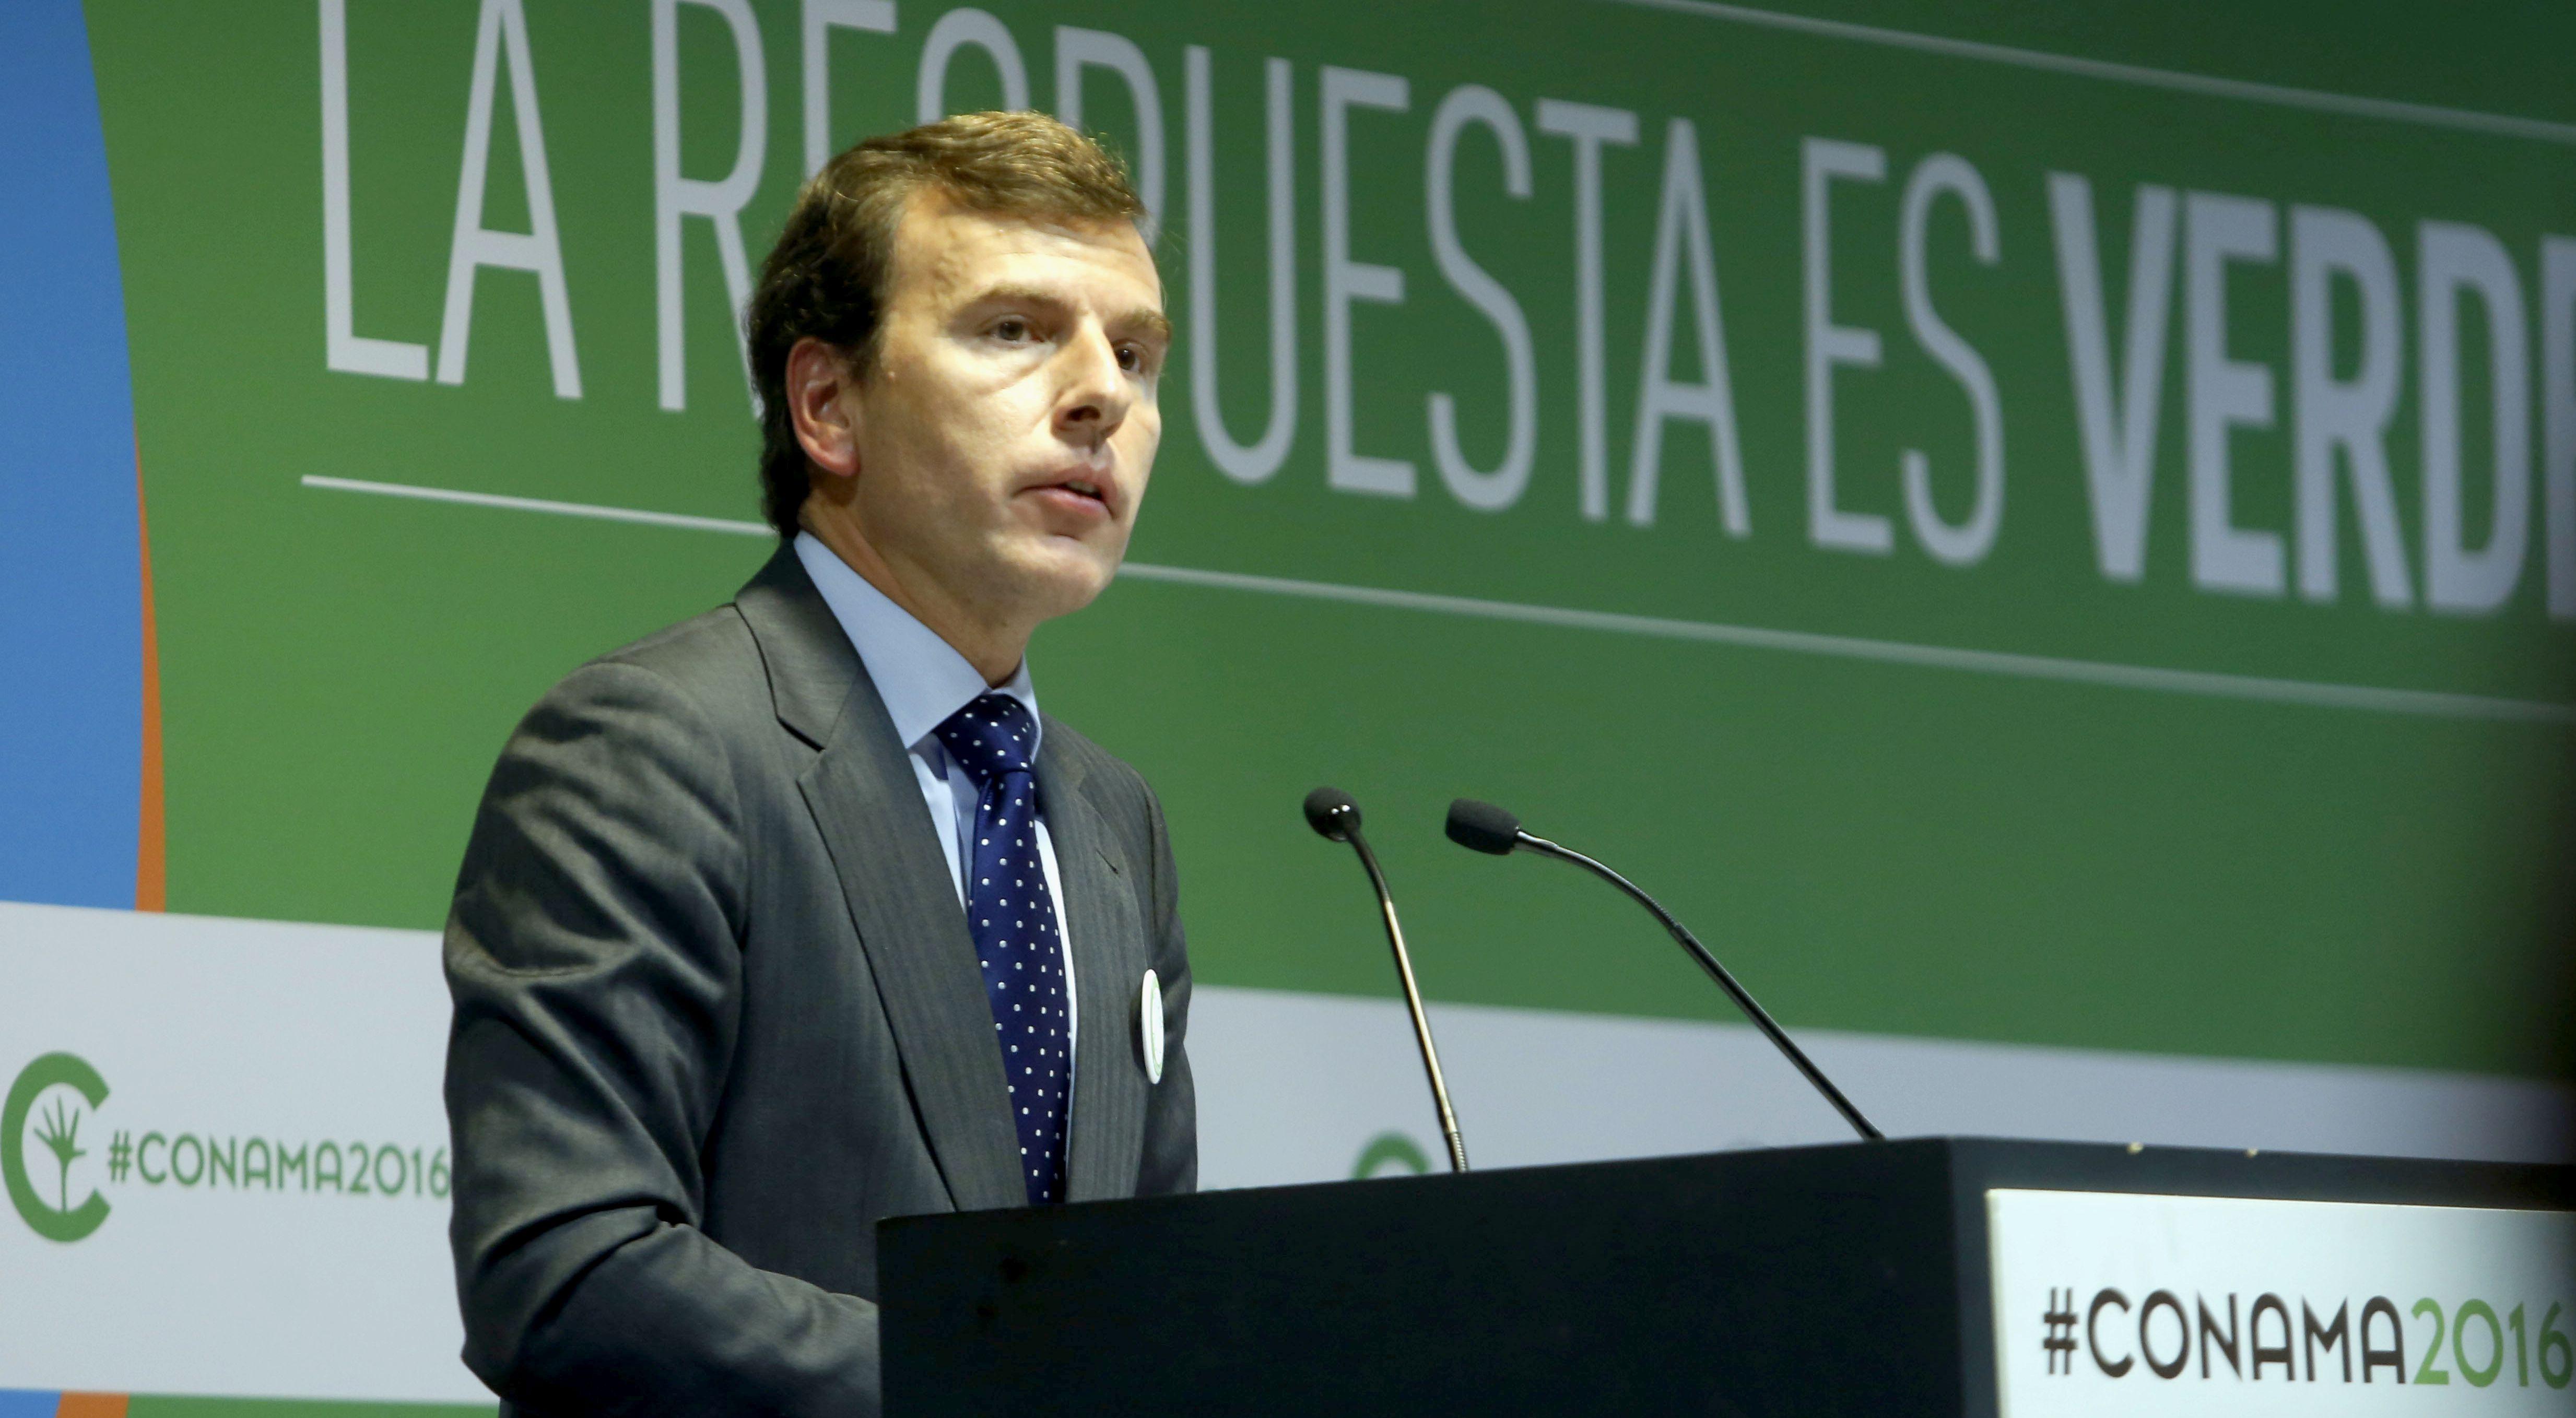 Pedro Saavedra